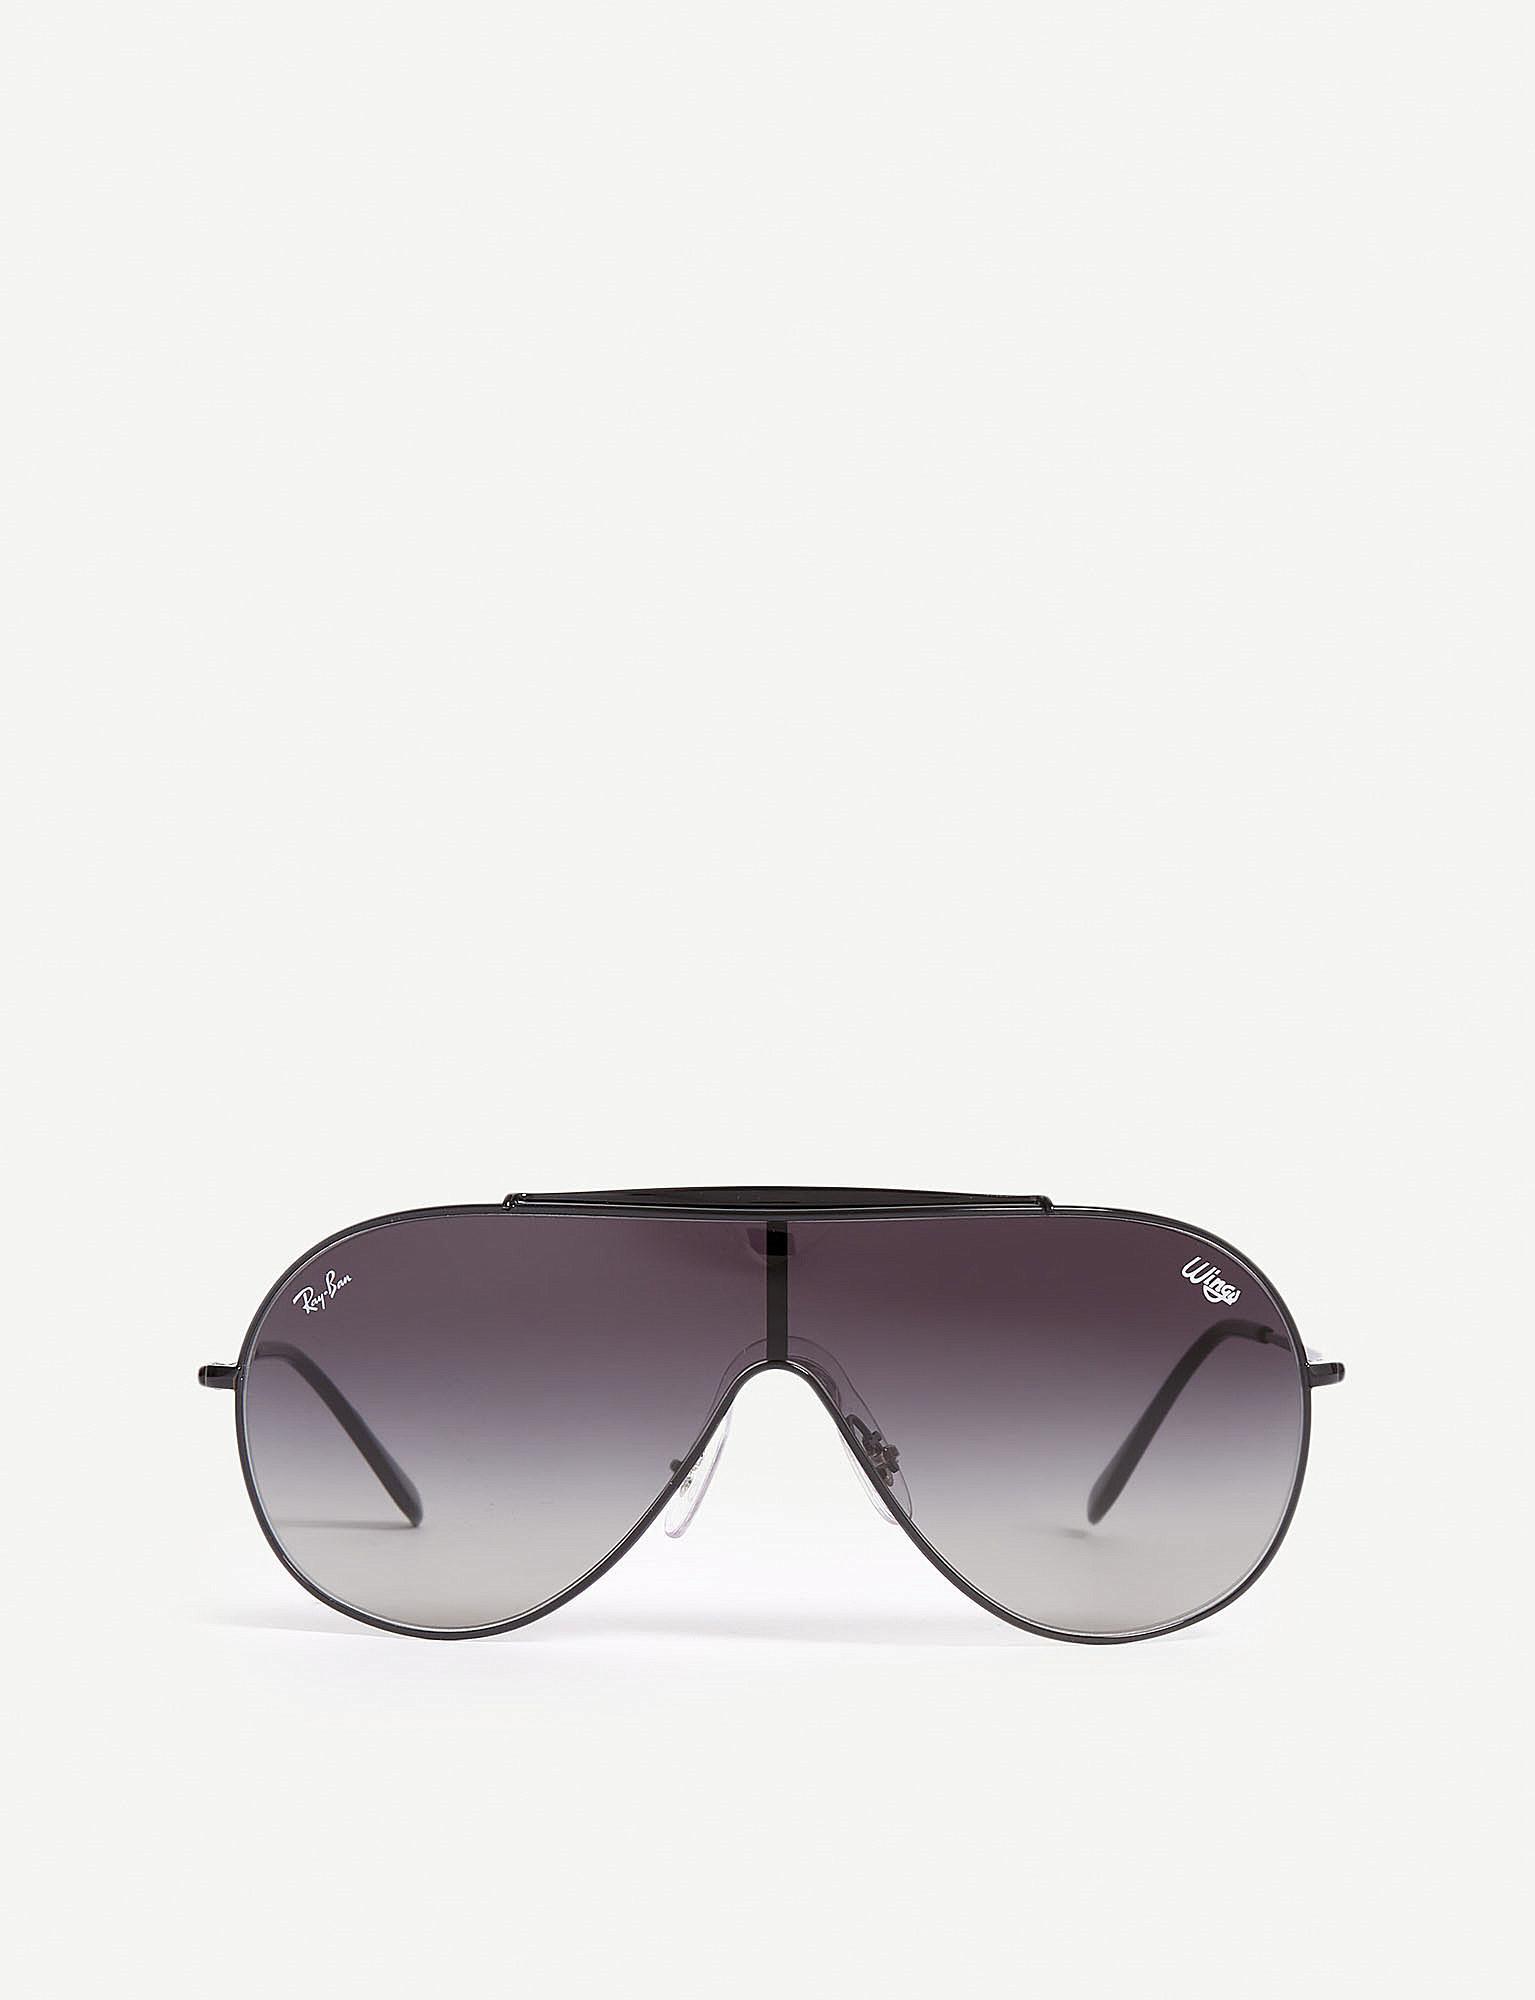 1dde628fc4 Ray-Ban Rb3597 Pilot-frame Sunglasses in Black - Lyst